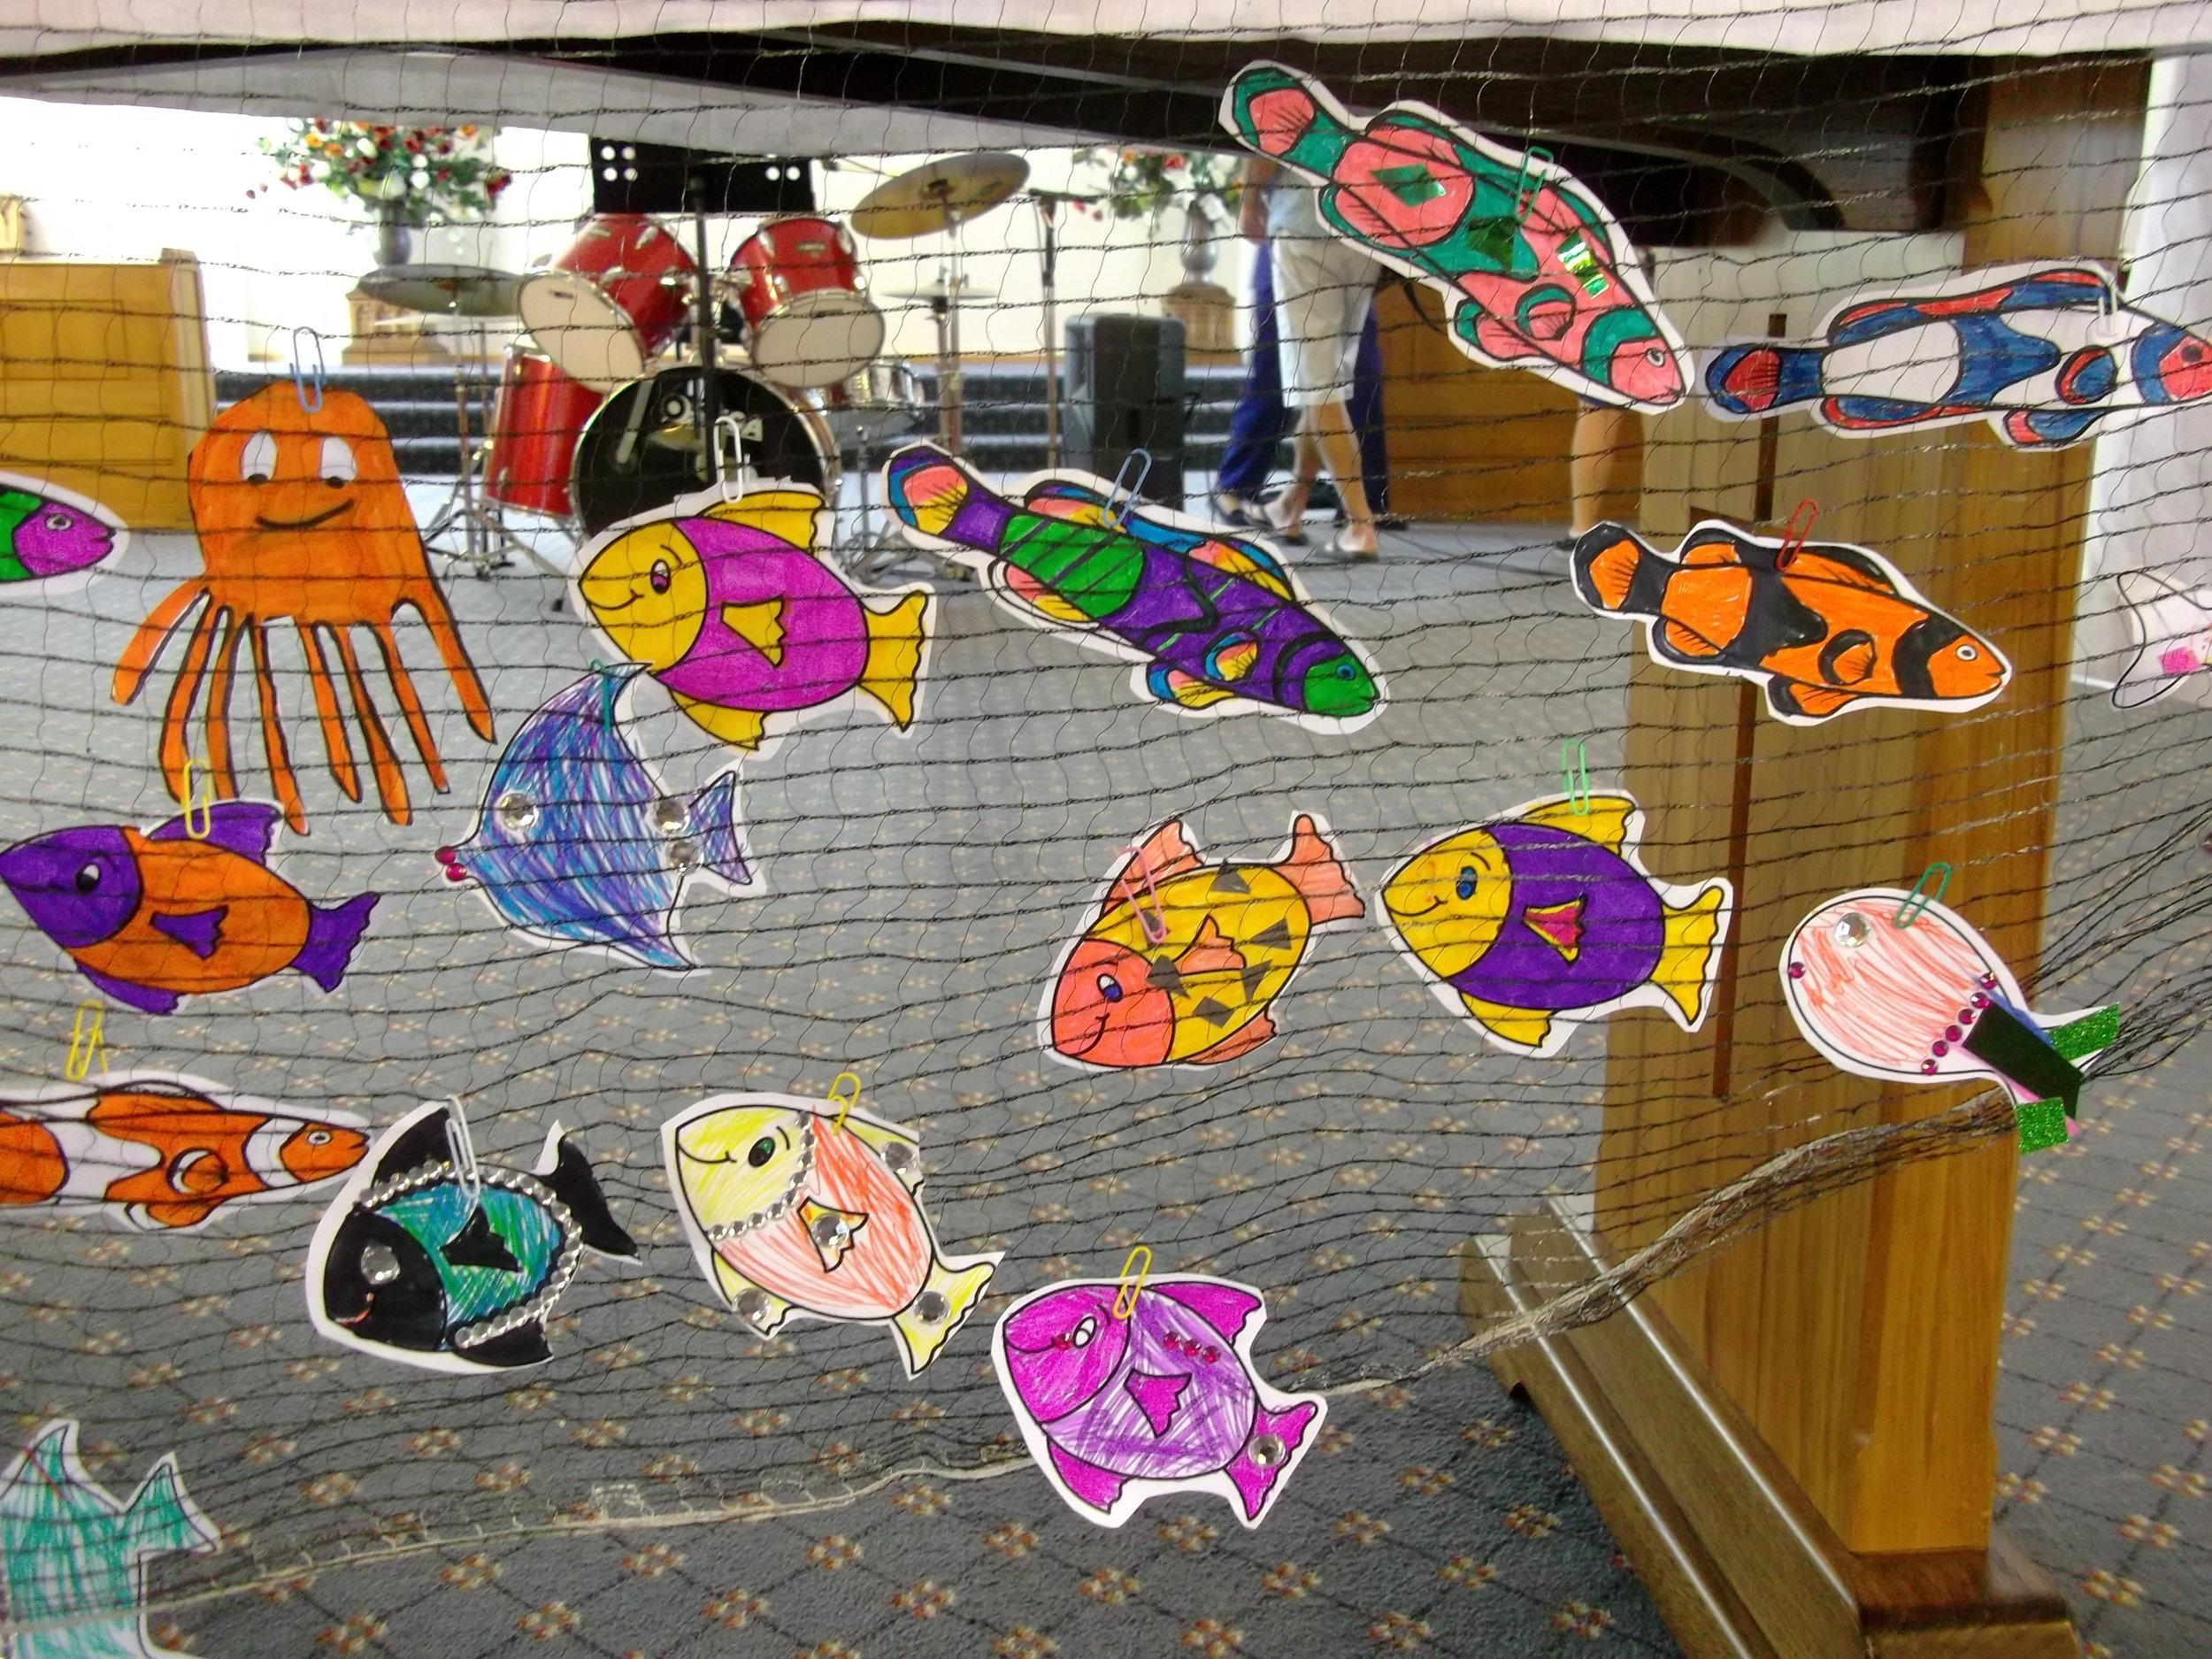 f 10-2-19 Children & fishing net (4).jpg